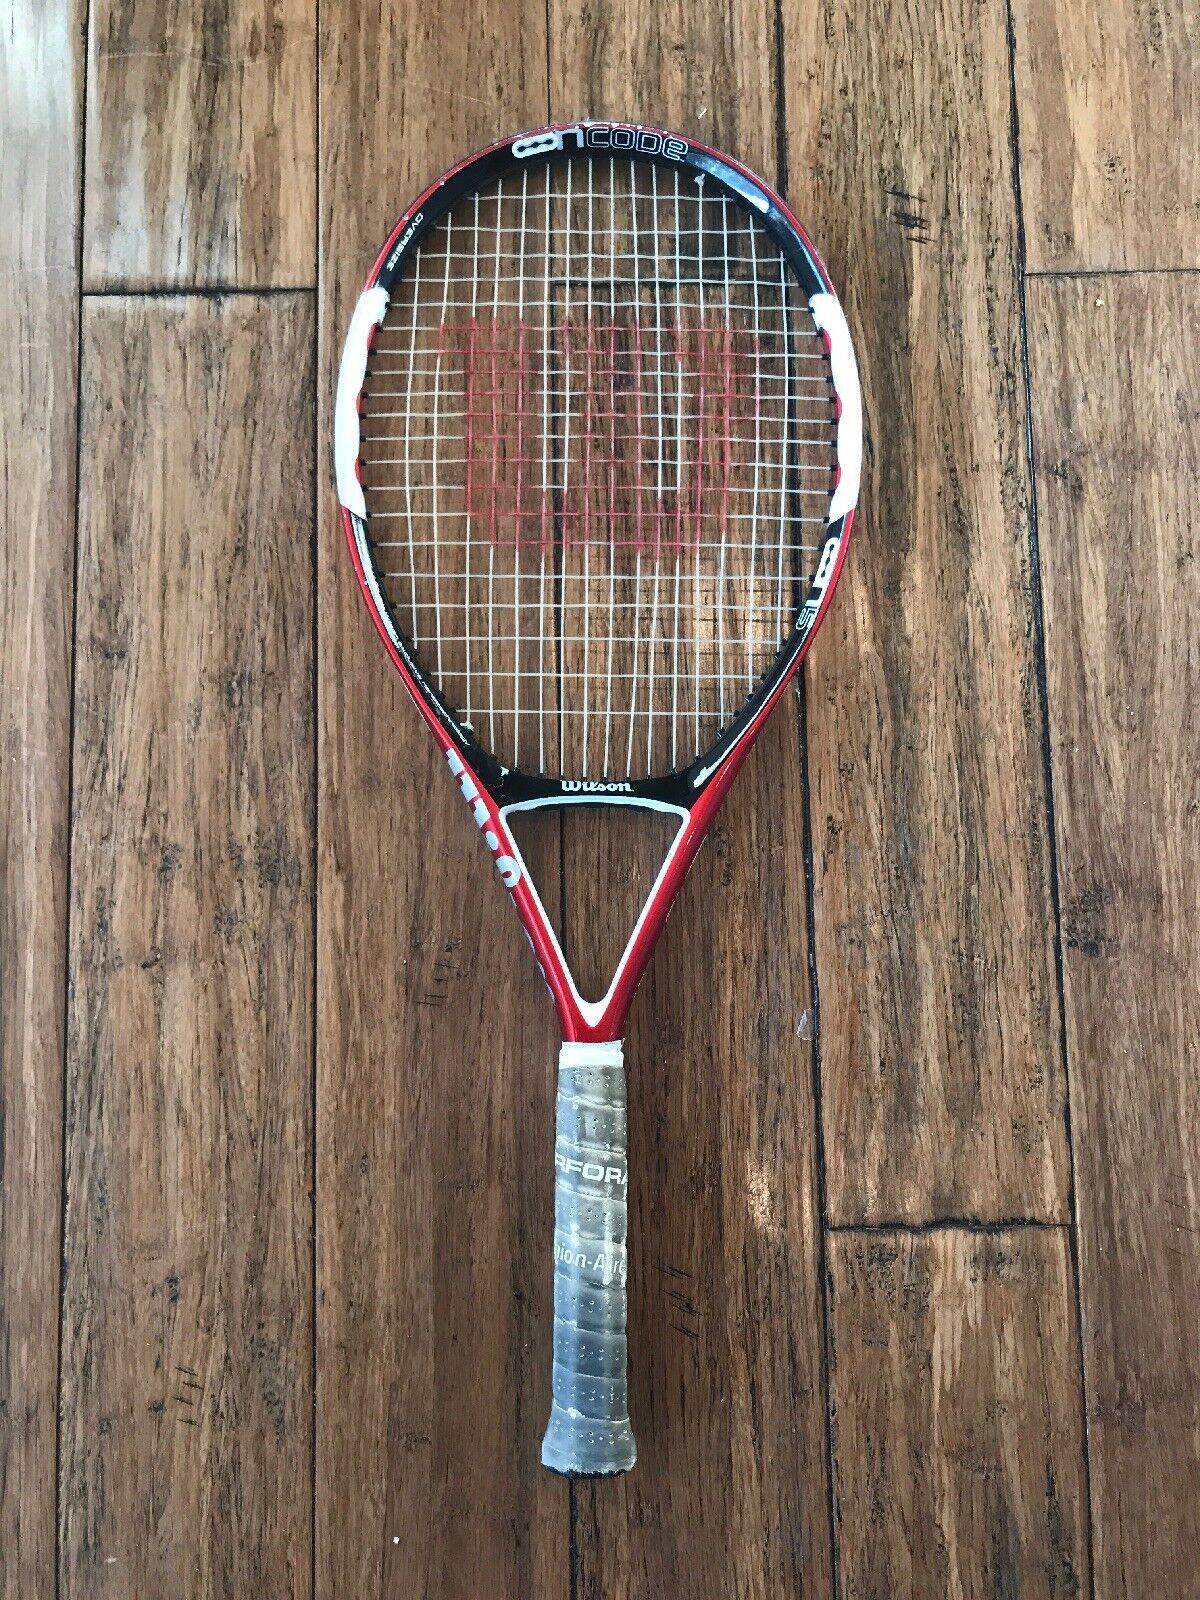 WILSON nCode N5 Force Tennis Racquet 27.25  Long 264 Grams Red 16x20 4 1 2